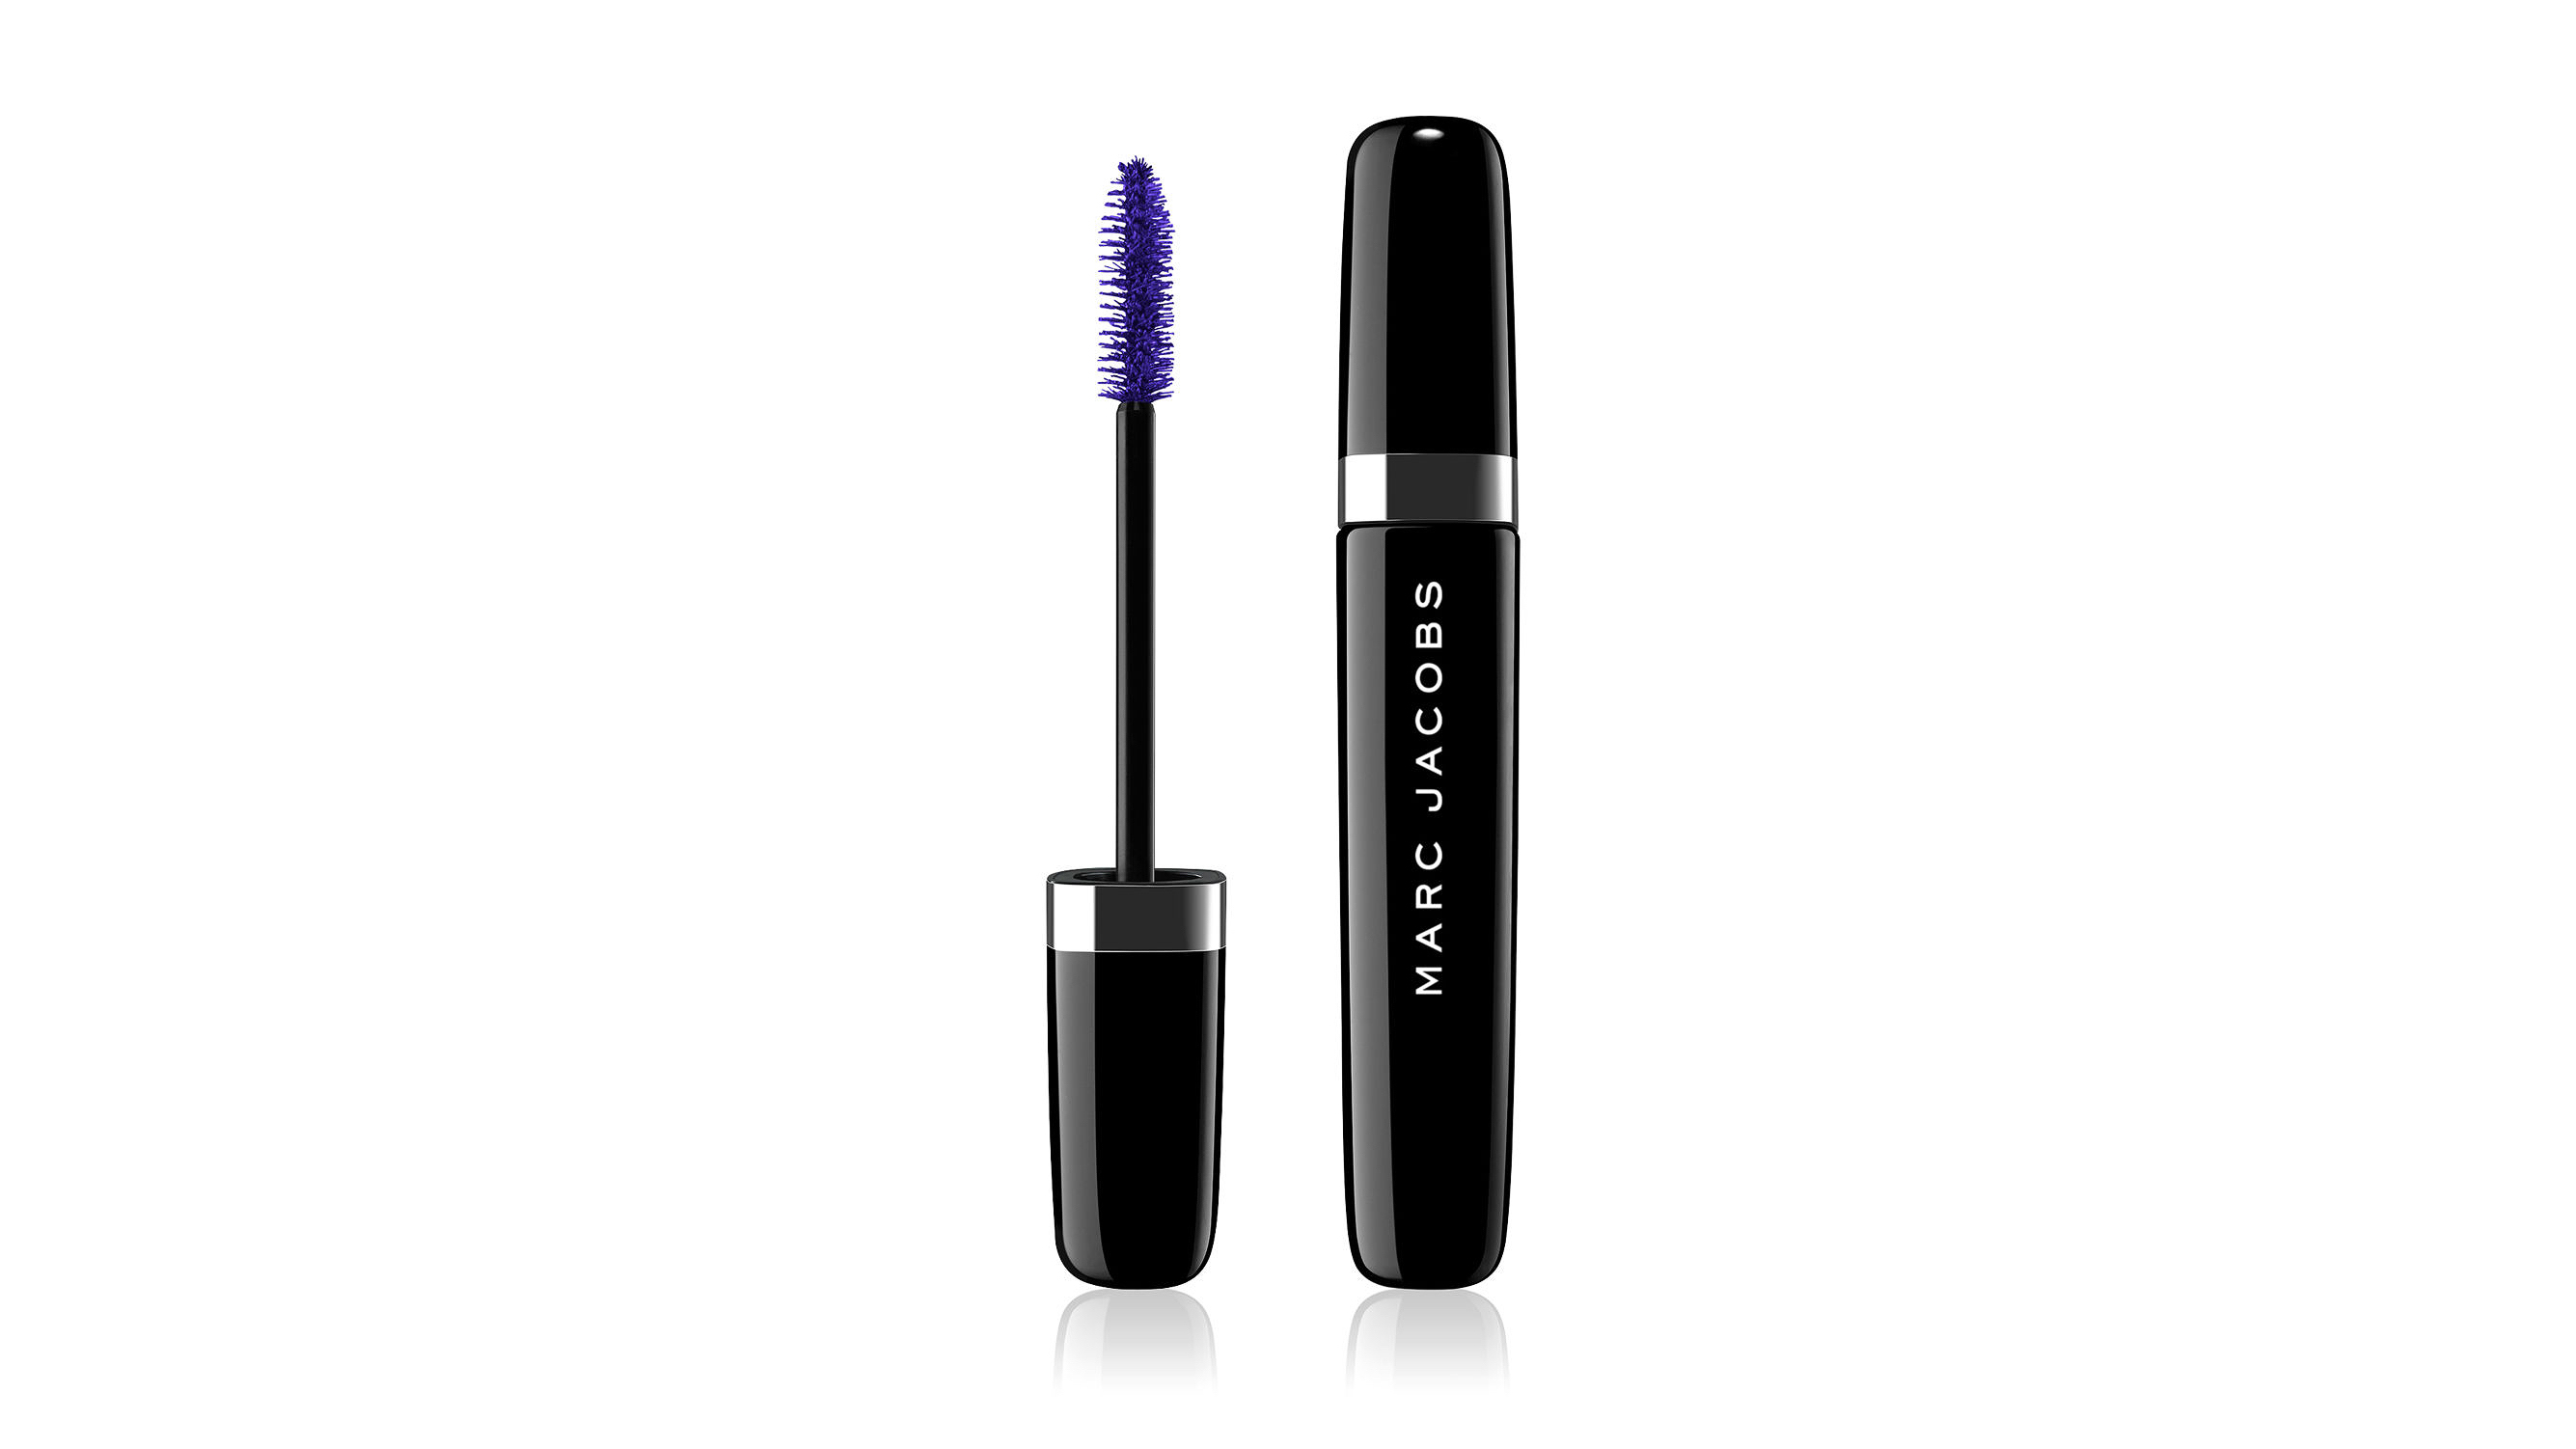 beauty product marc jacobs mascara